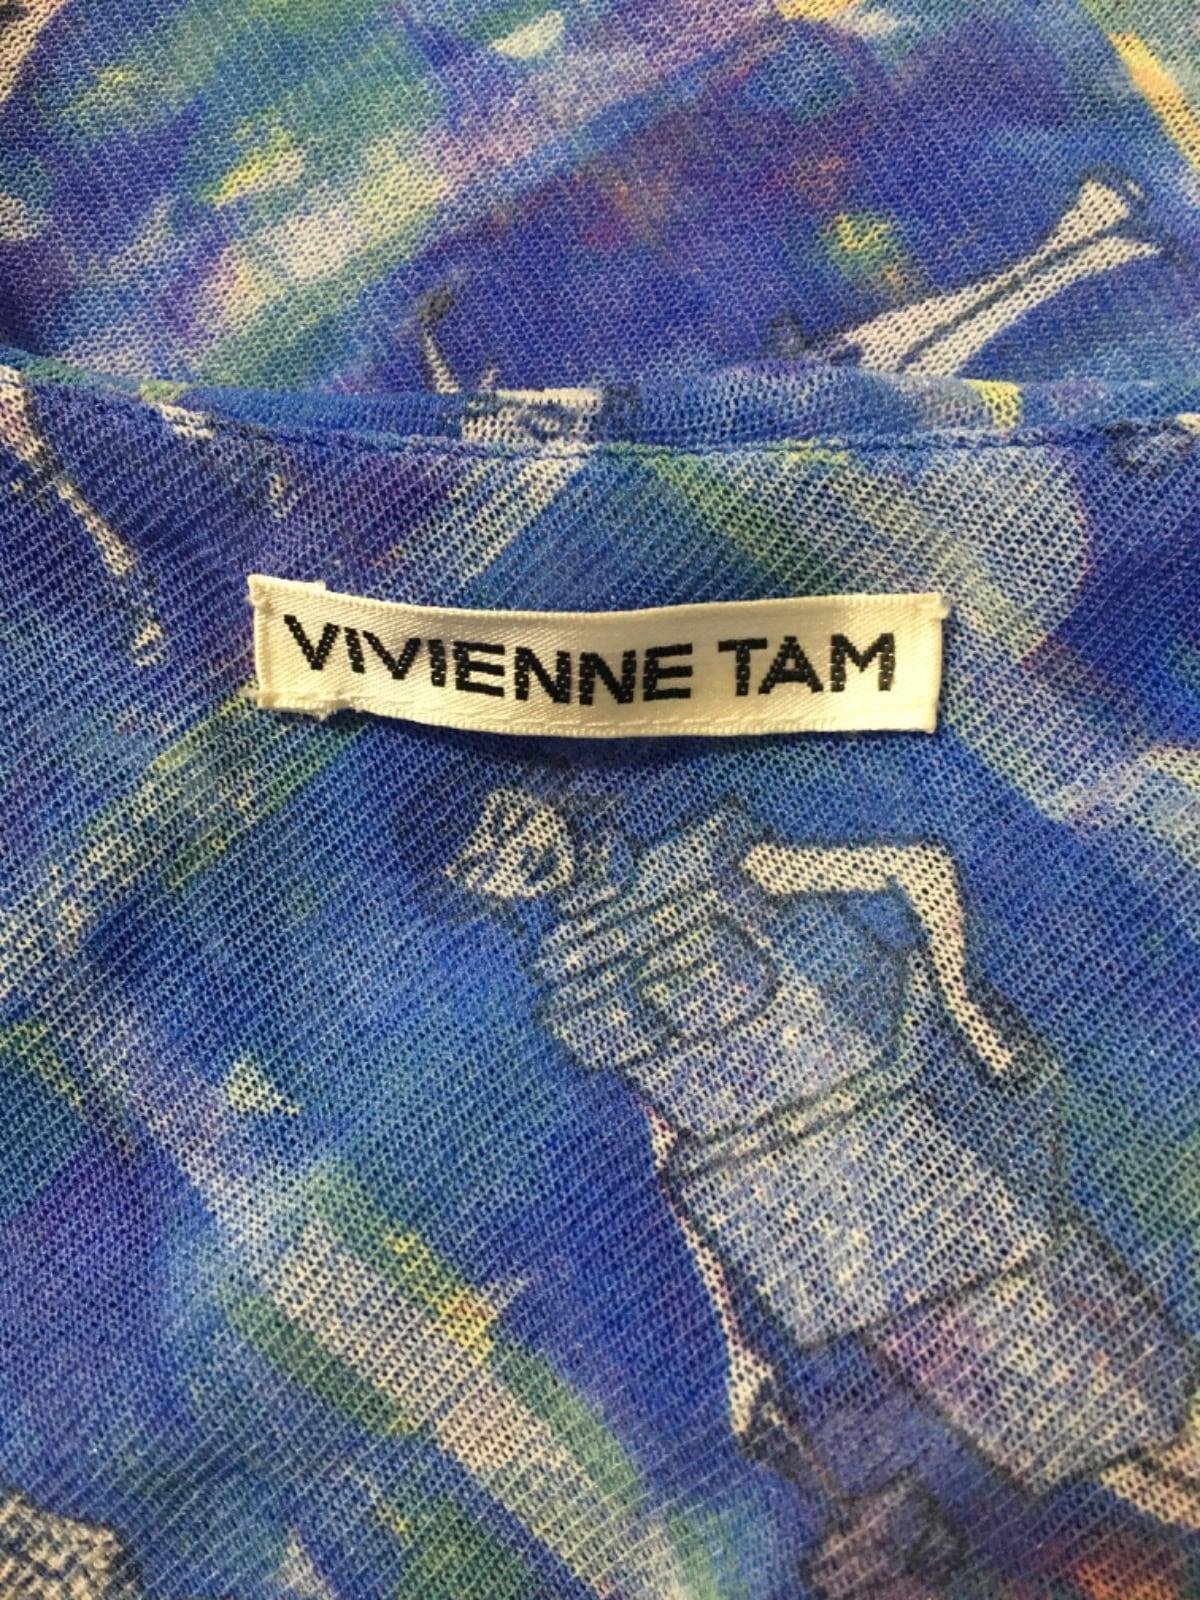 VIVIENNE TAM(ヴィヴィアンタム)のカットソー